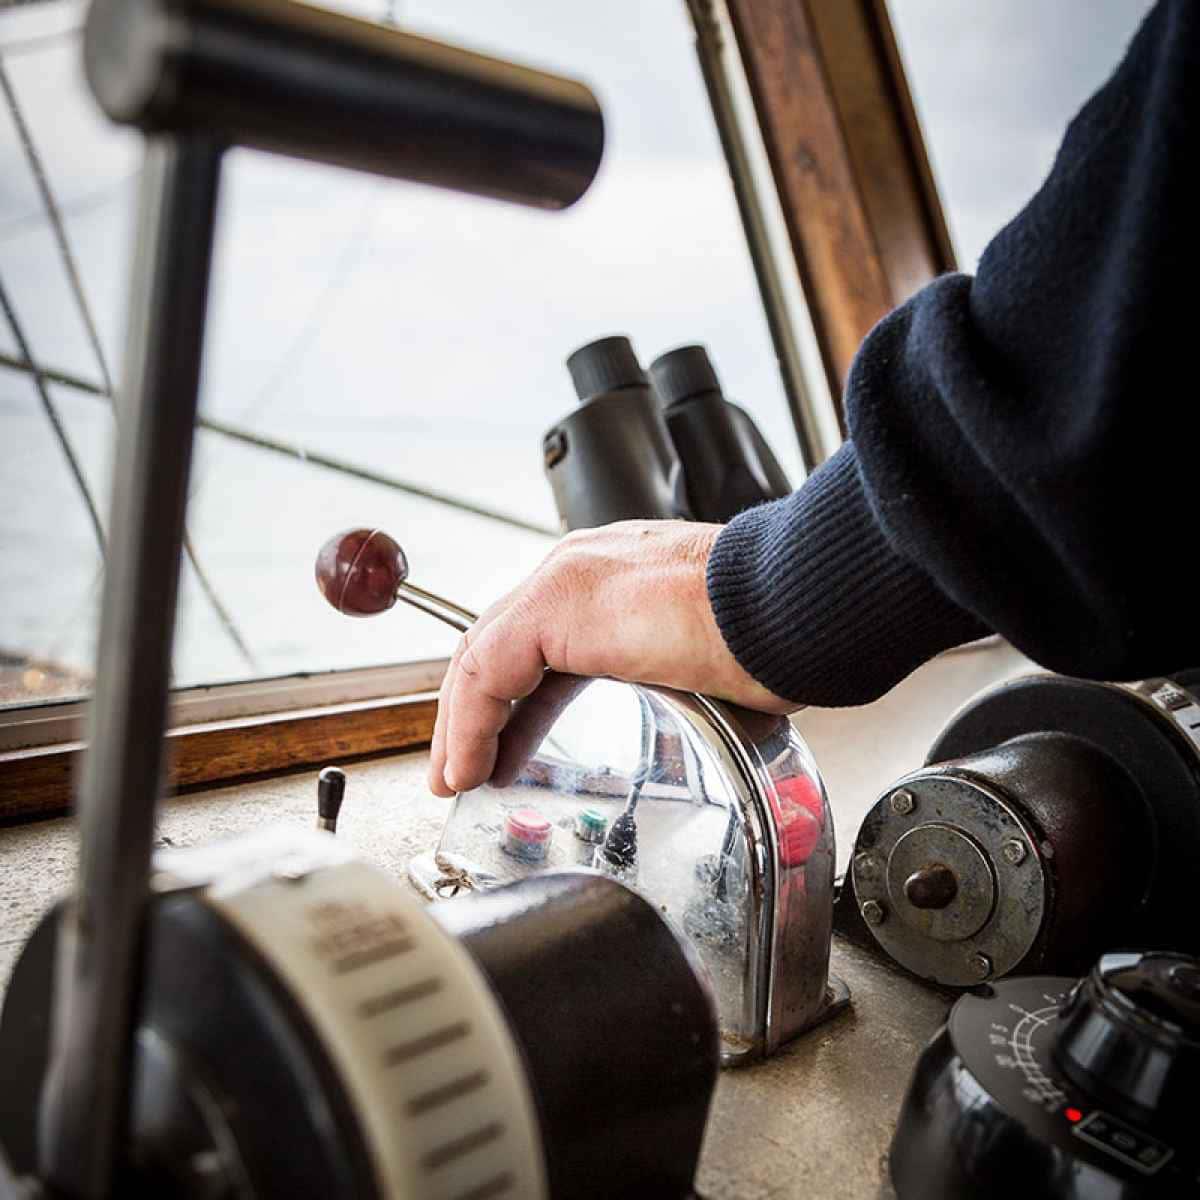 photographe reportage culinaire pecheur bateau